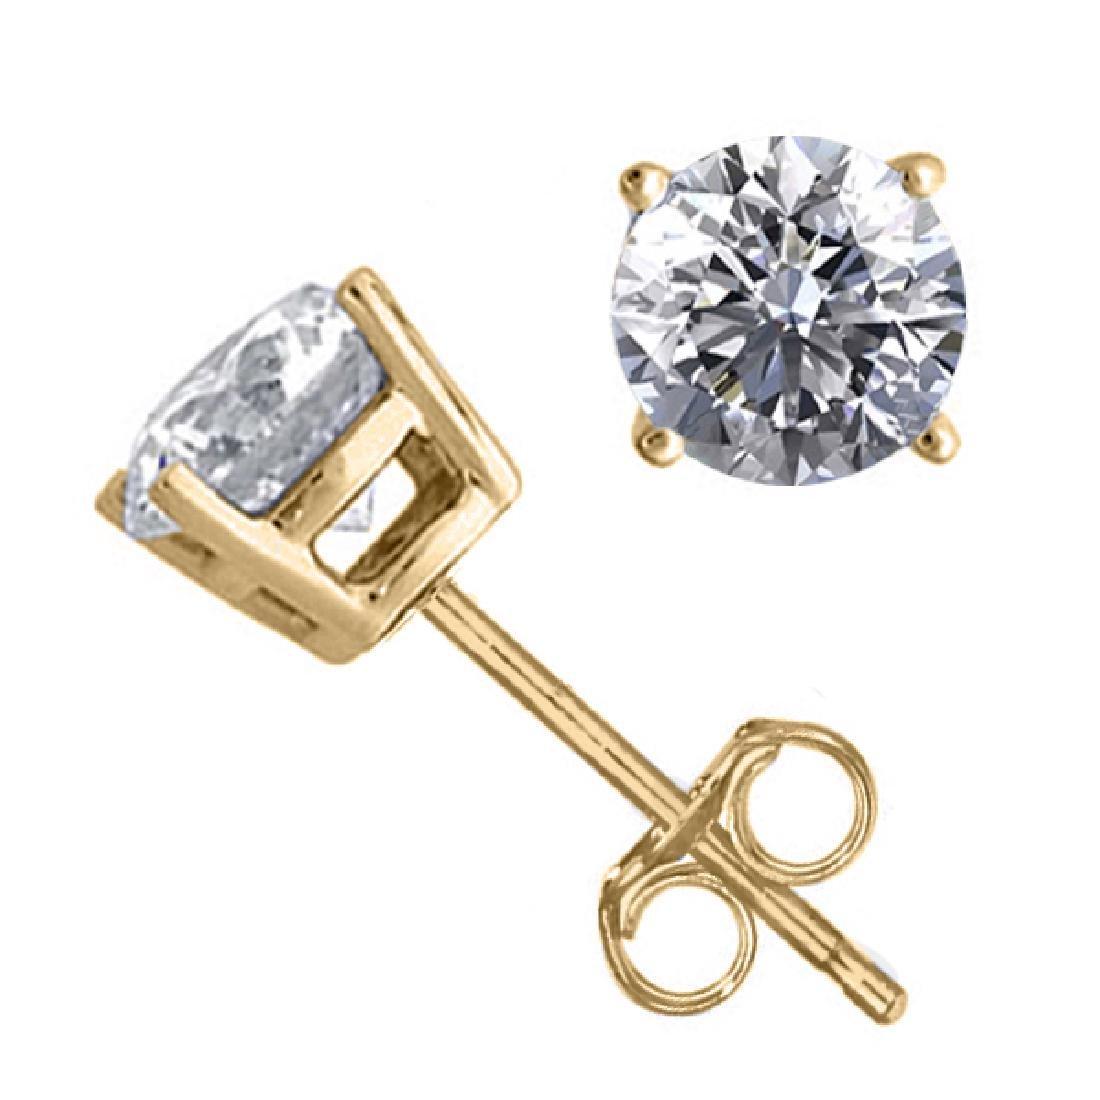 14K Yellow Gold Jewelry 1.56 ctw Natural Diamond Stud